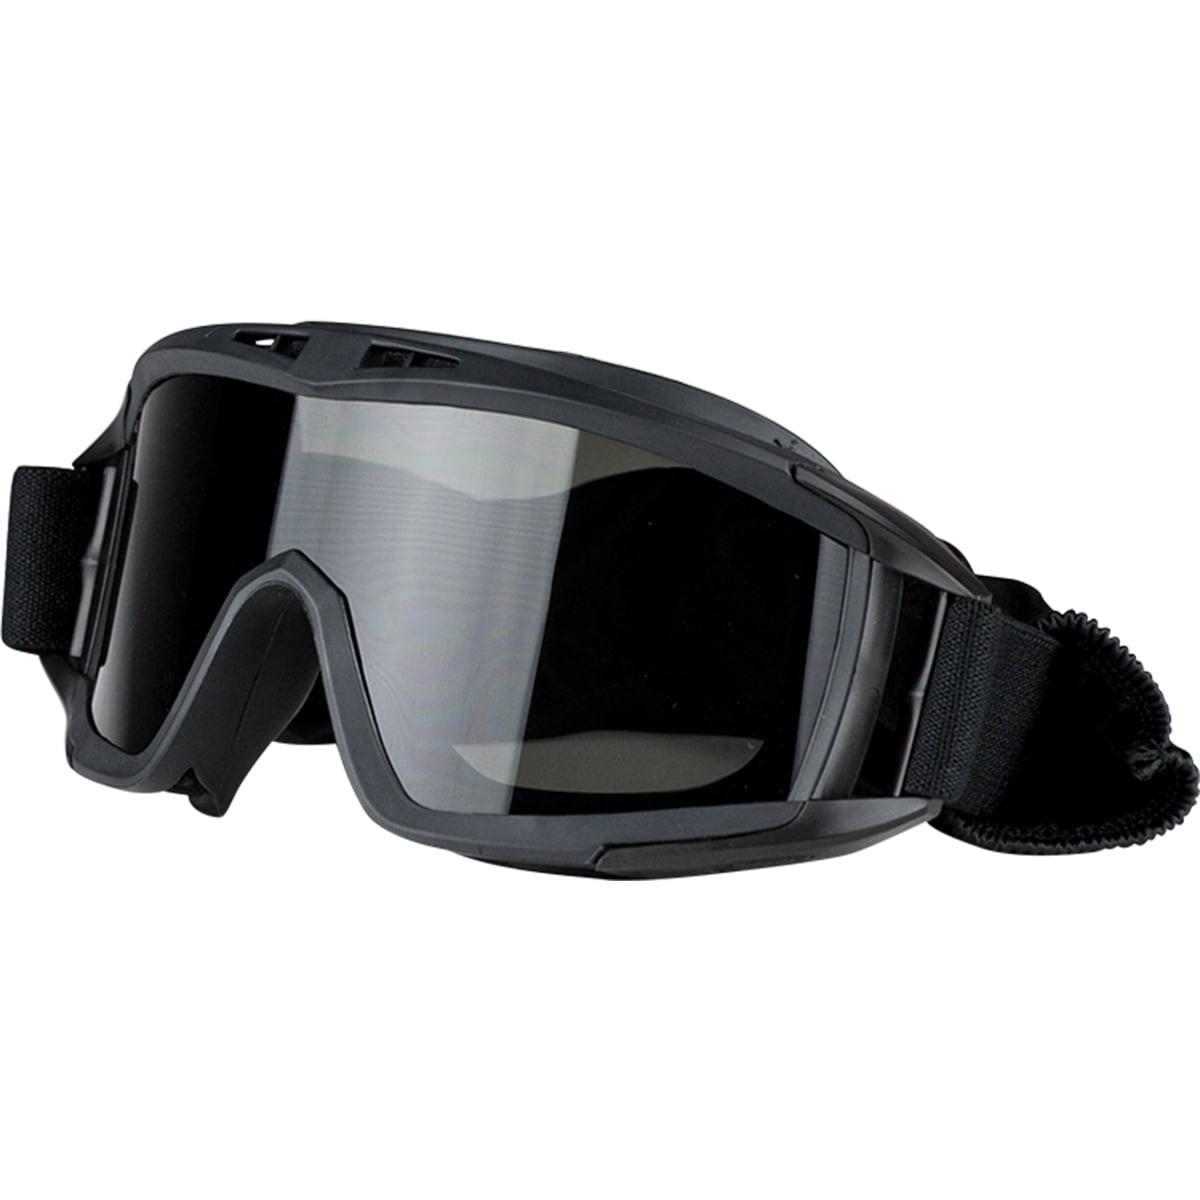 Valken Airsoft Goggles V-TAC Tango Black by Valken